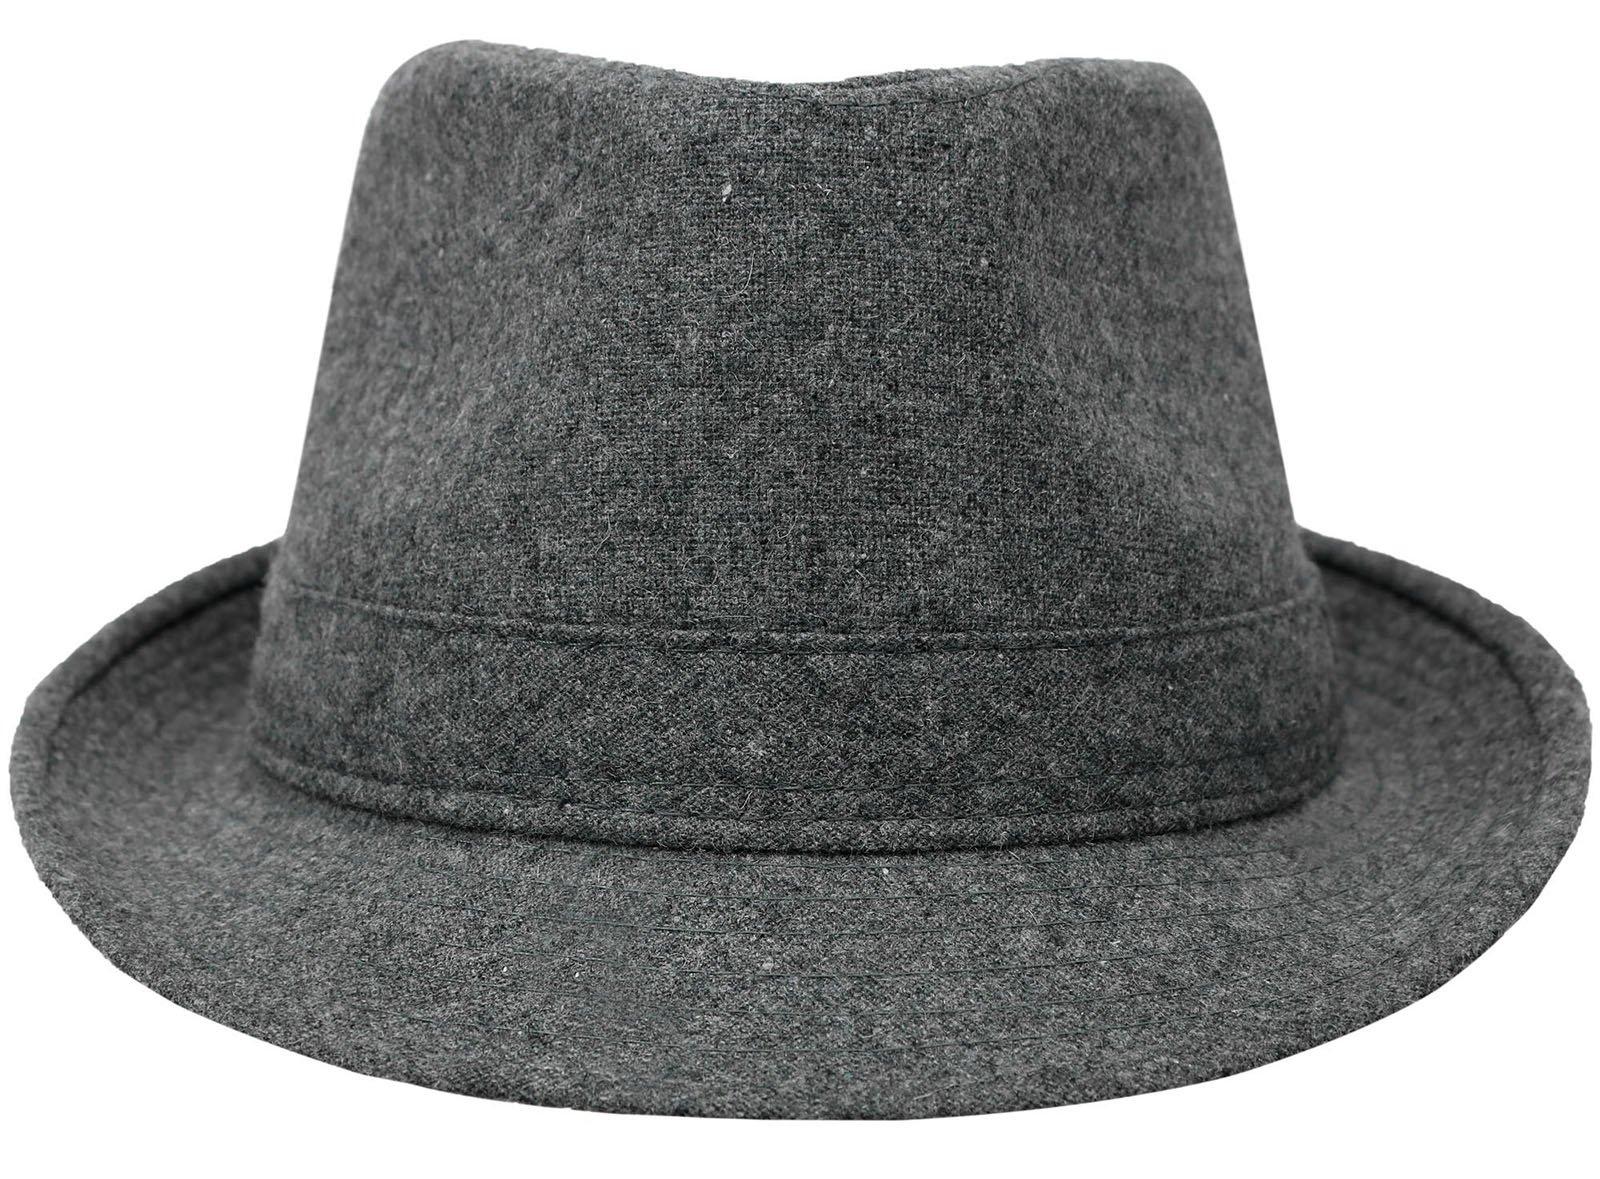 Men / Women's Wool Blend Fedora Hat,C.Grey